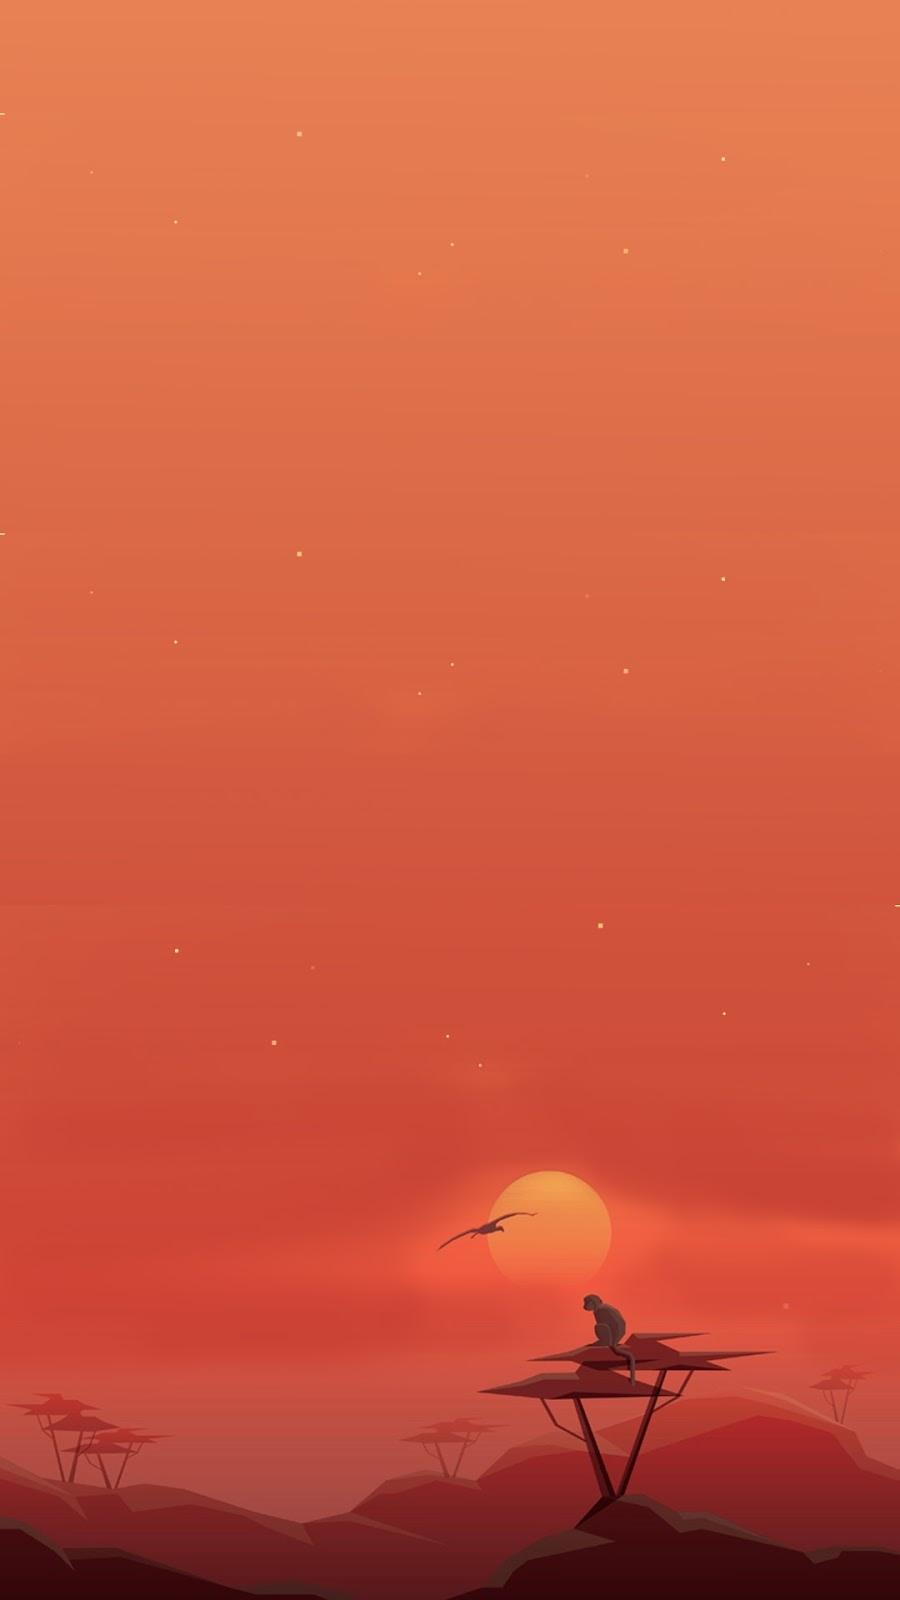 sunset monkey orange simple wallpaper mobile